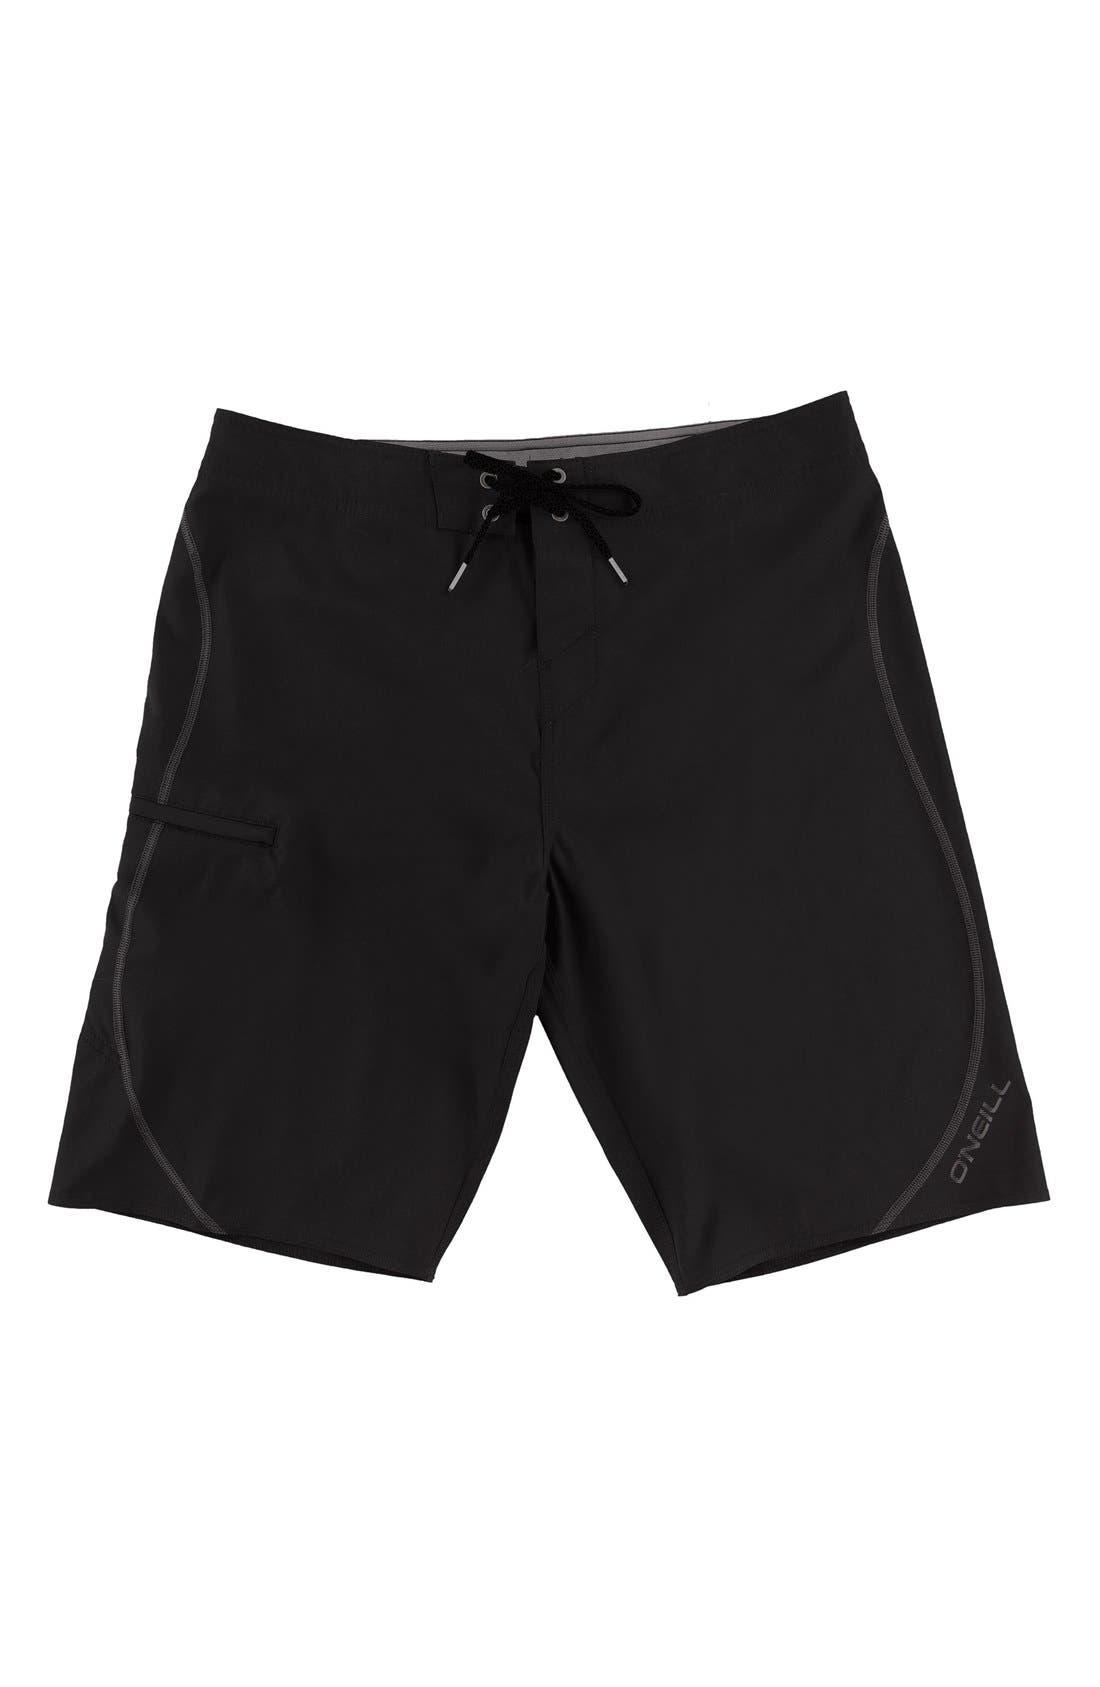 Hyperfreak S-Seam Stretch Board Shorts,                         Main,                         color, Black